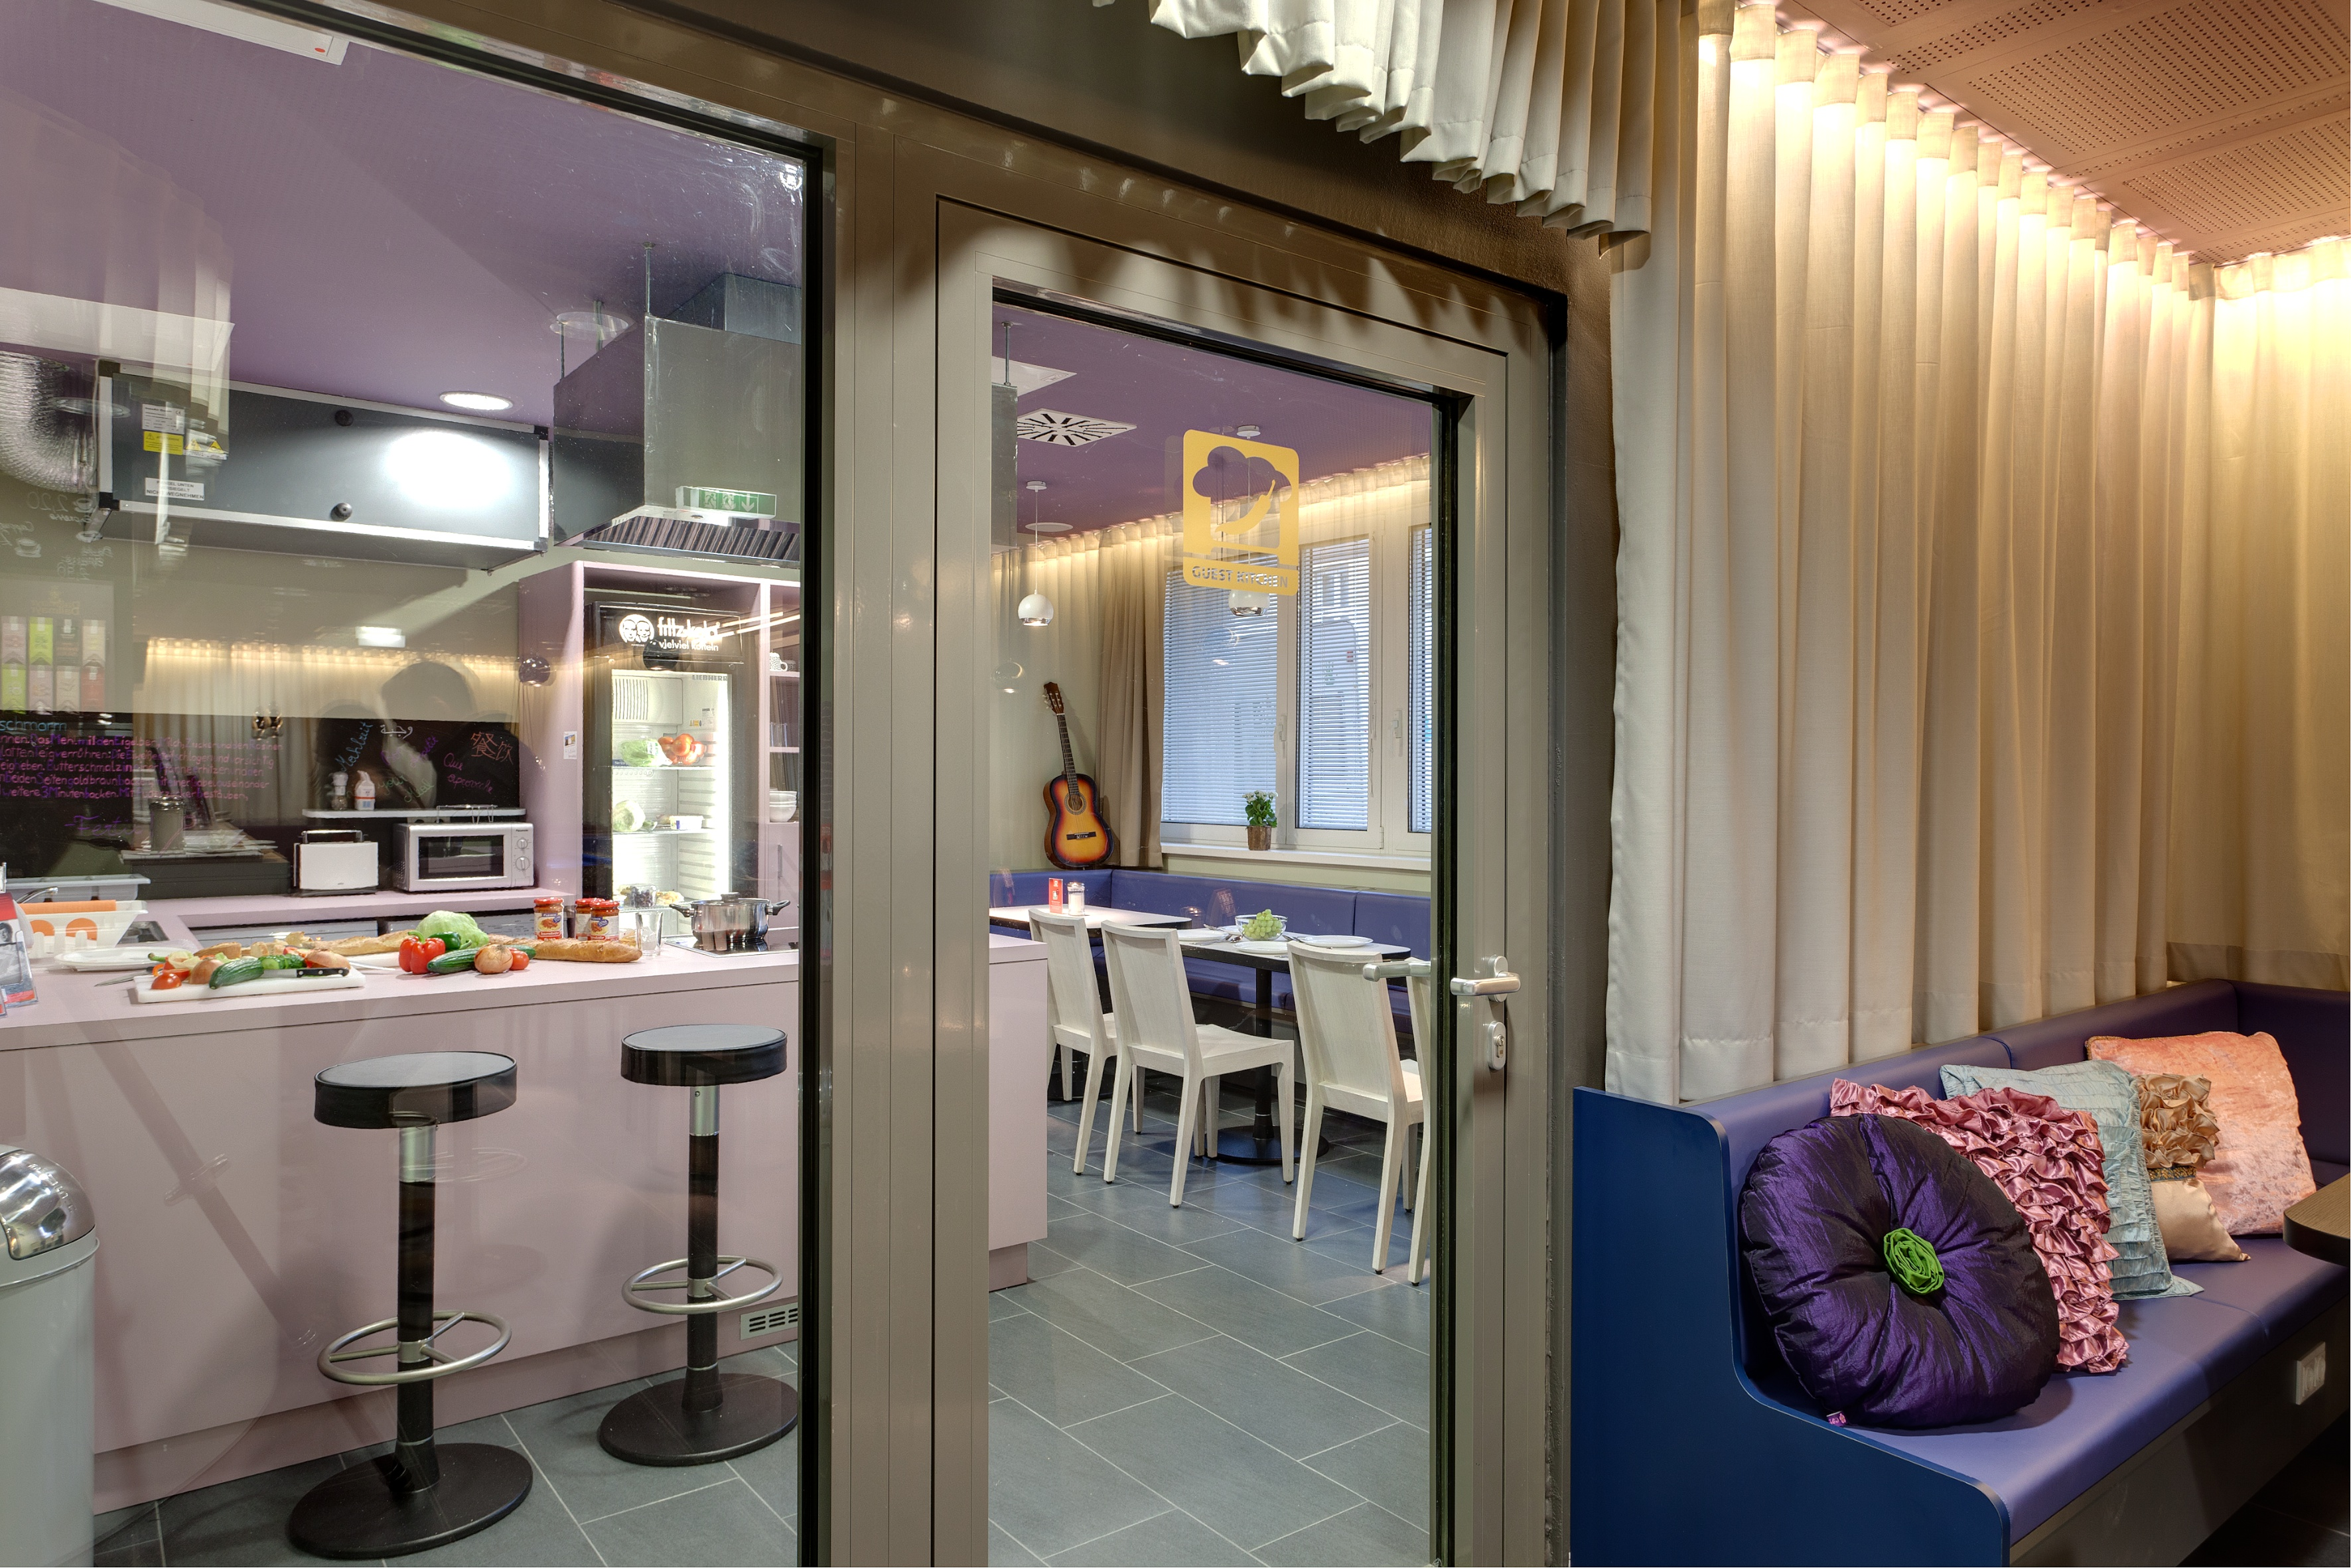 MEININGER Hotel Vienna Downtown Sissi - Cuisine commune